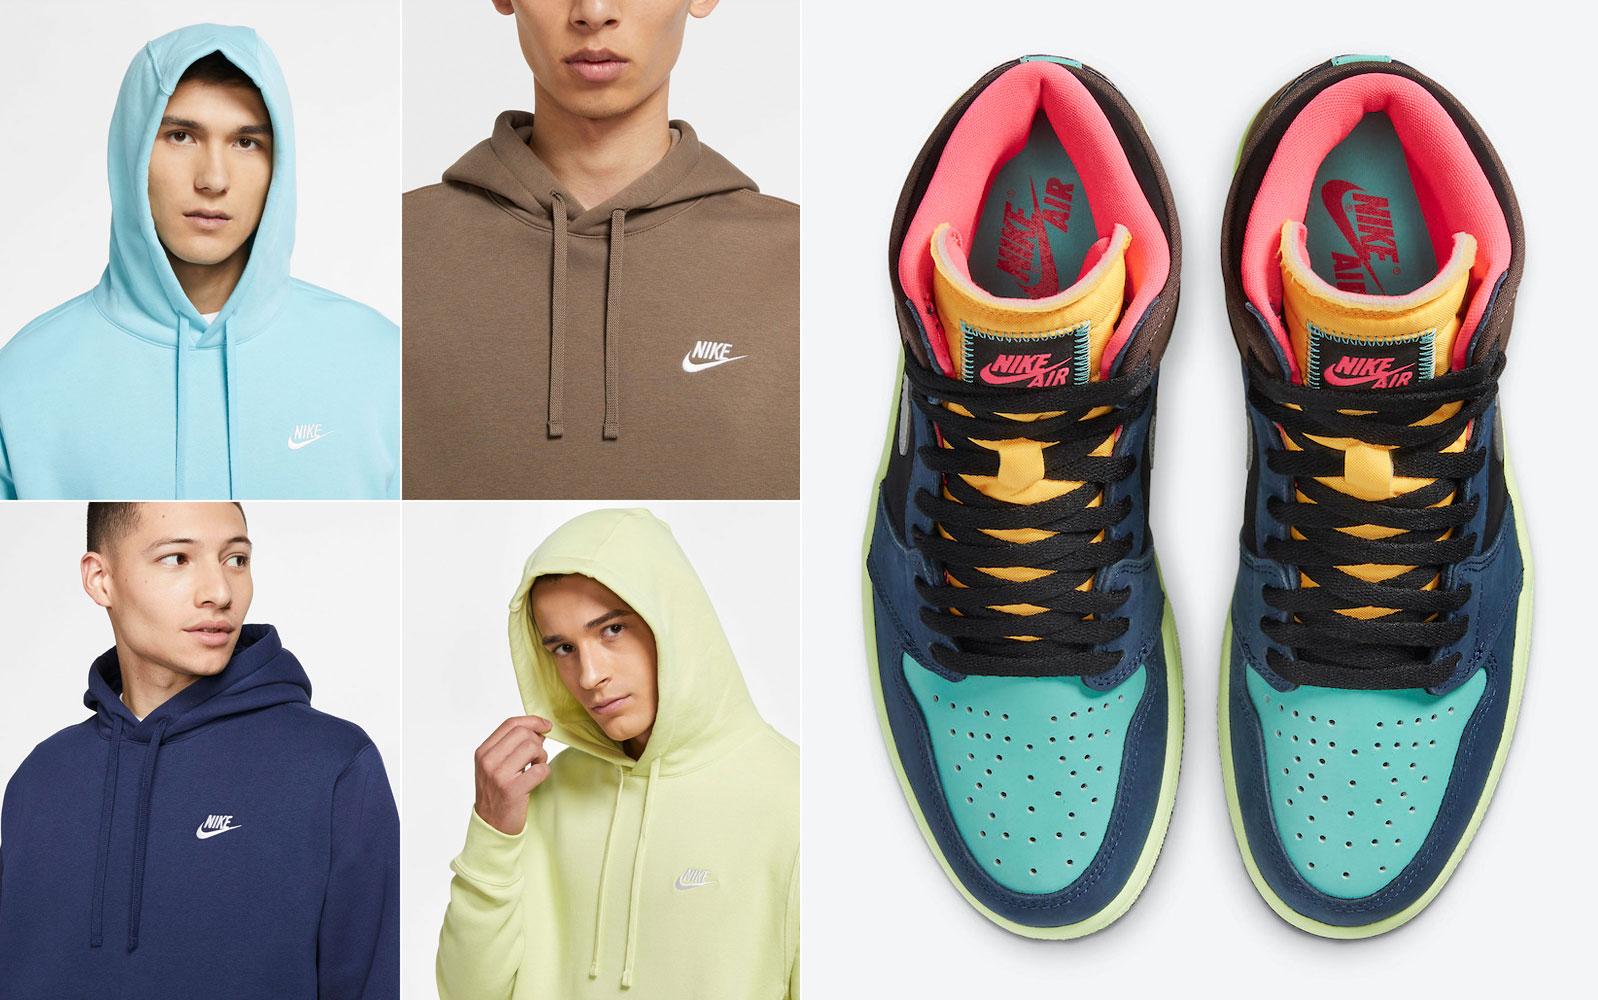 air-jordan-1-high-bio-hack-hoodies-to-match